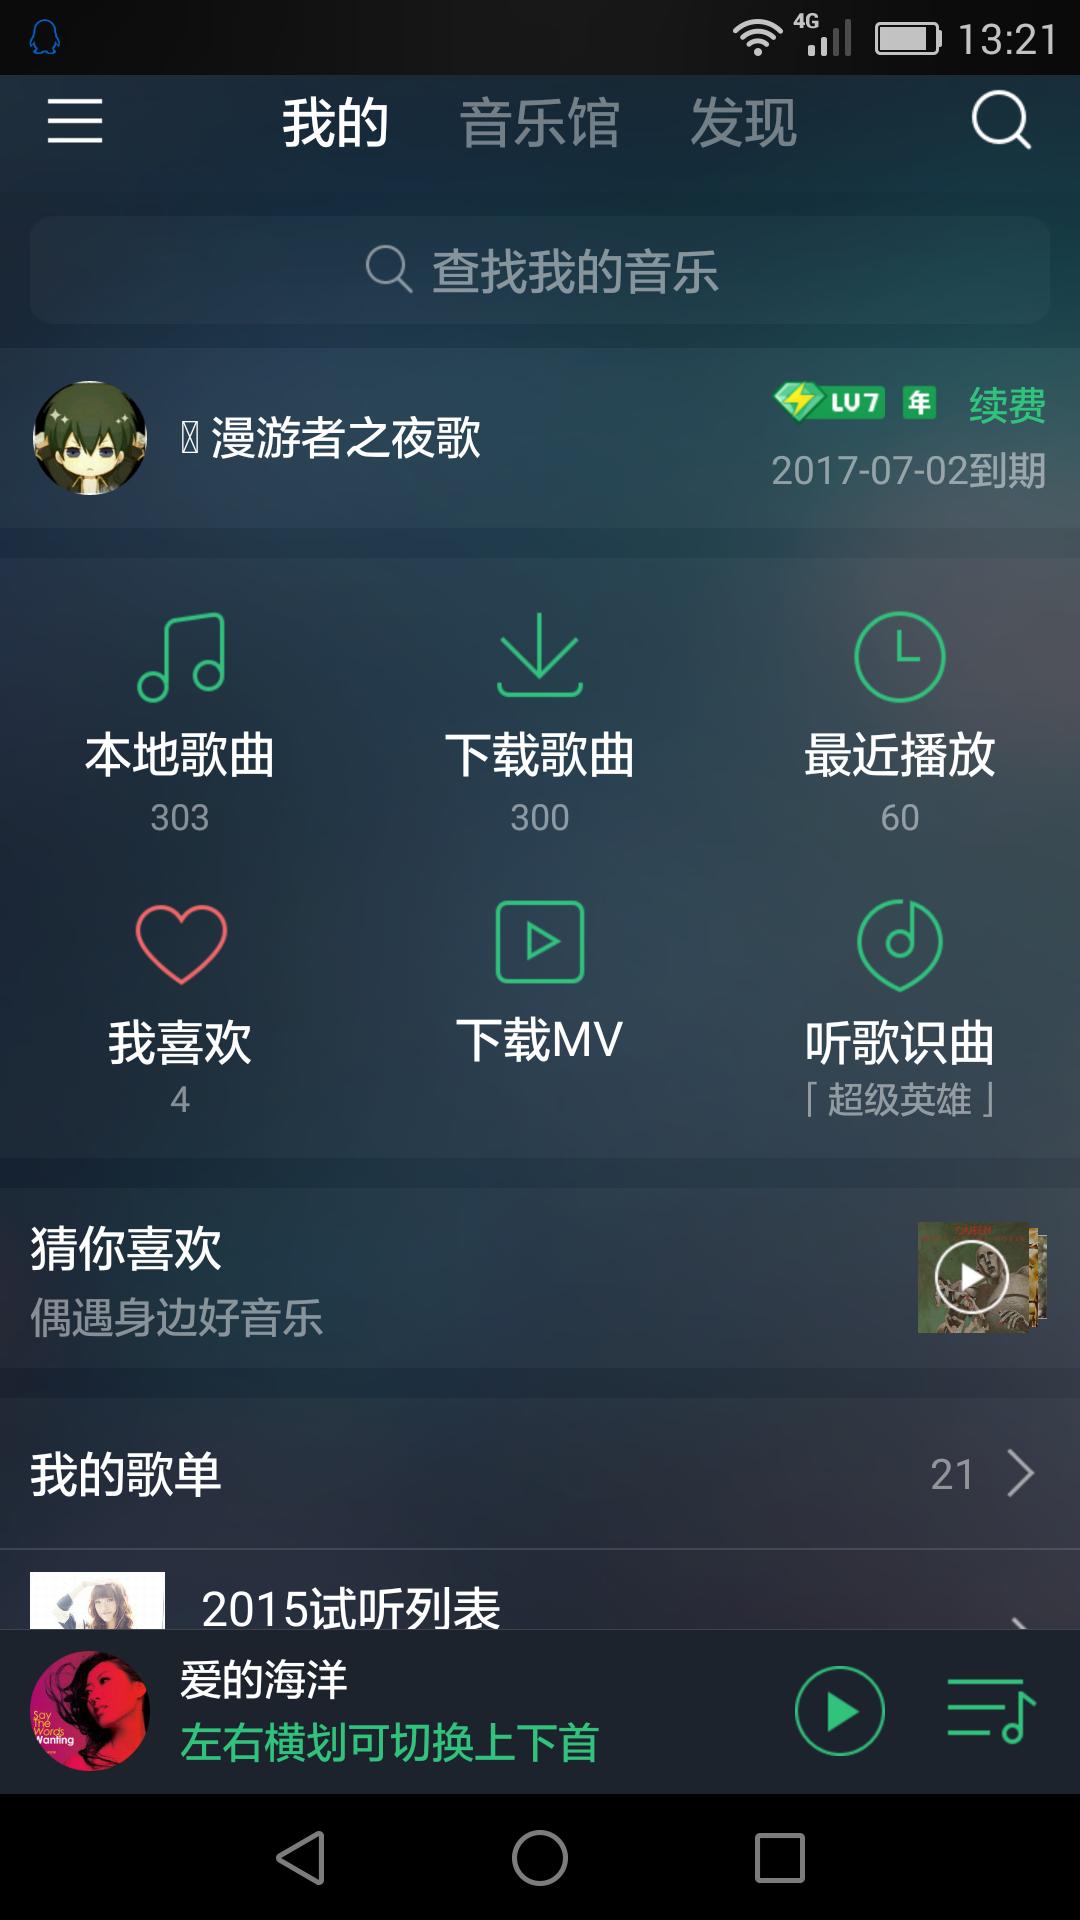 QQ音樂首創翻譯歌詞,覆蓋萬首熱門英日韓泰歌曲